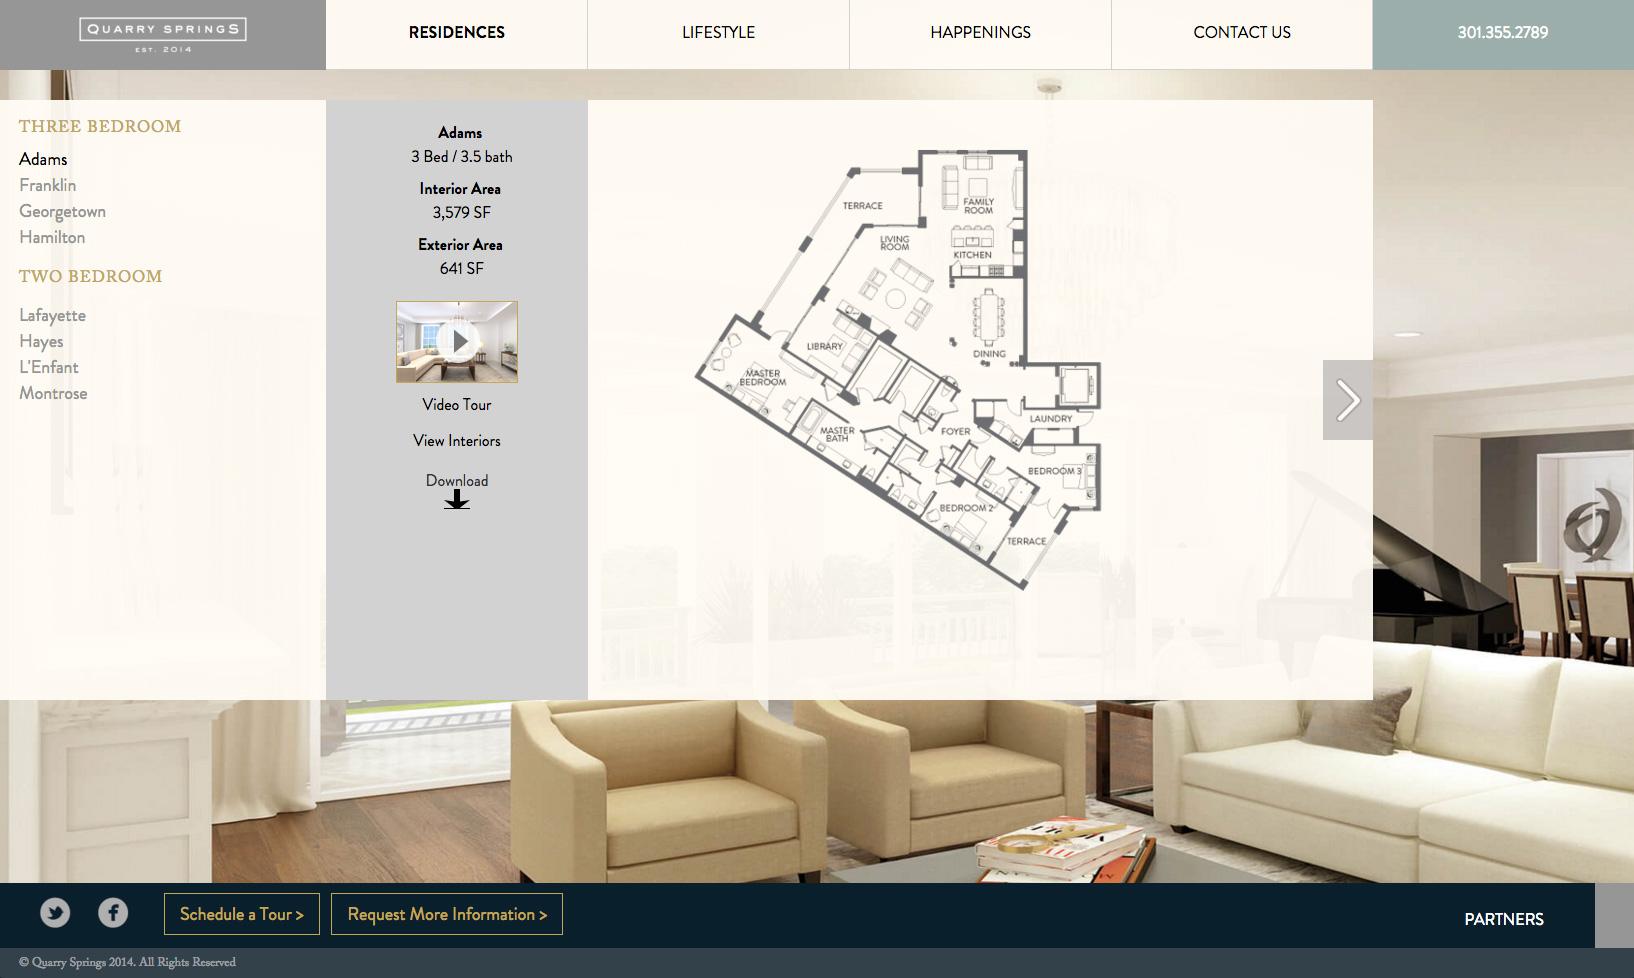 Quarry Springs Residences Page